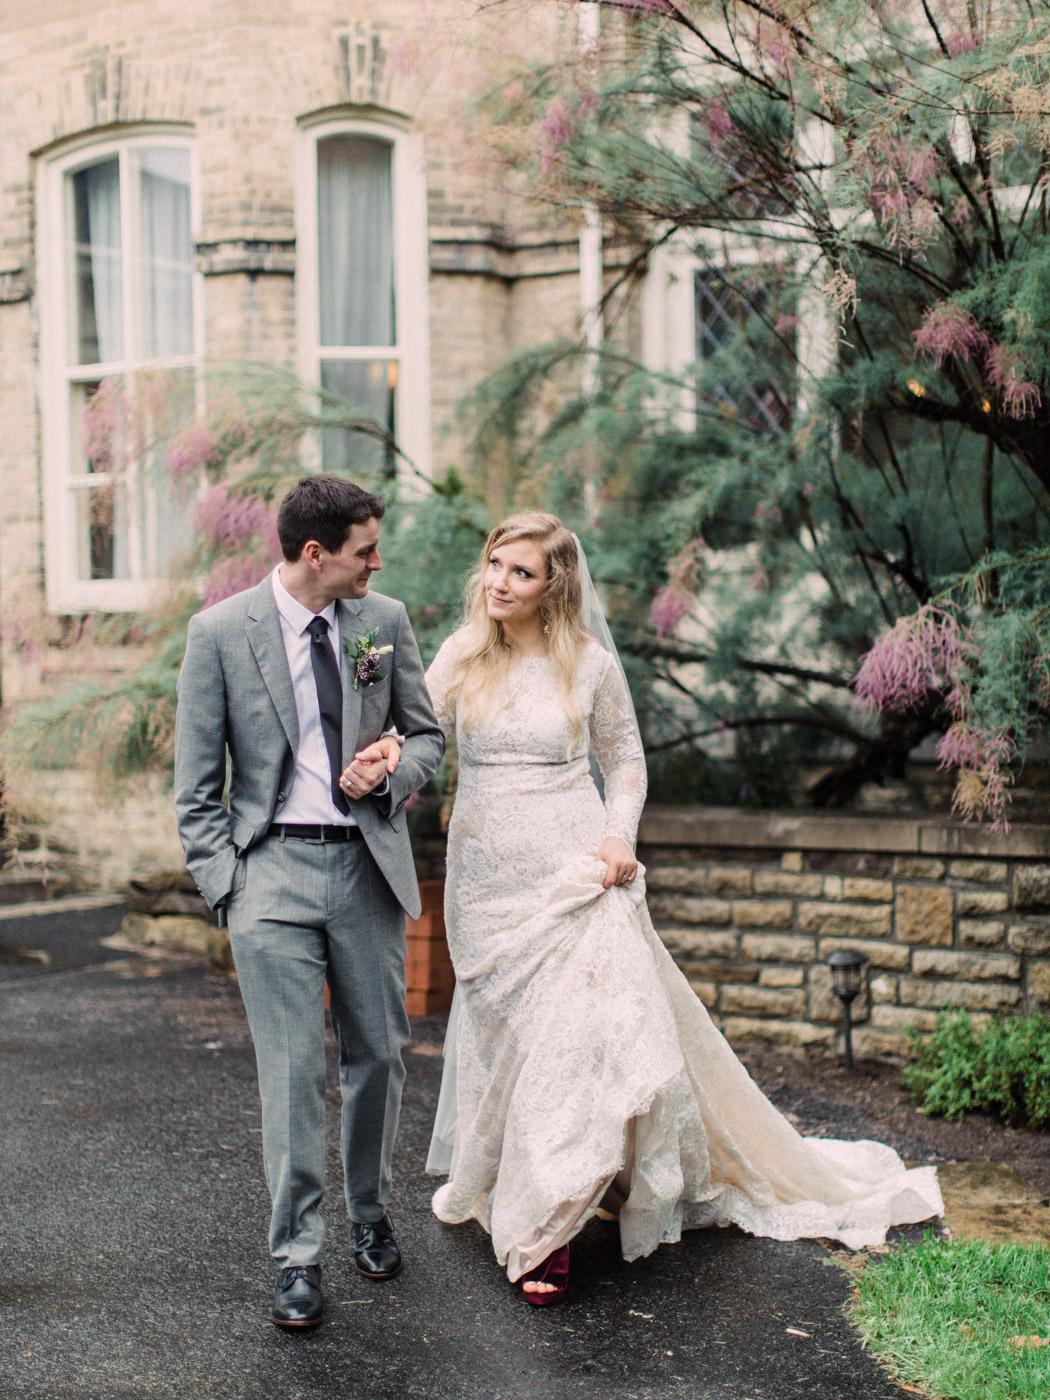 Toronto-wedding-photographer-intimate-classic-fine-art-elopement-ottawa55.jpg